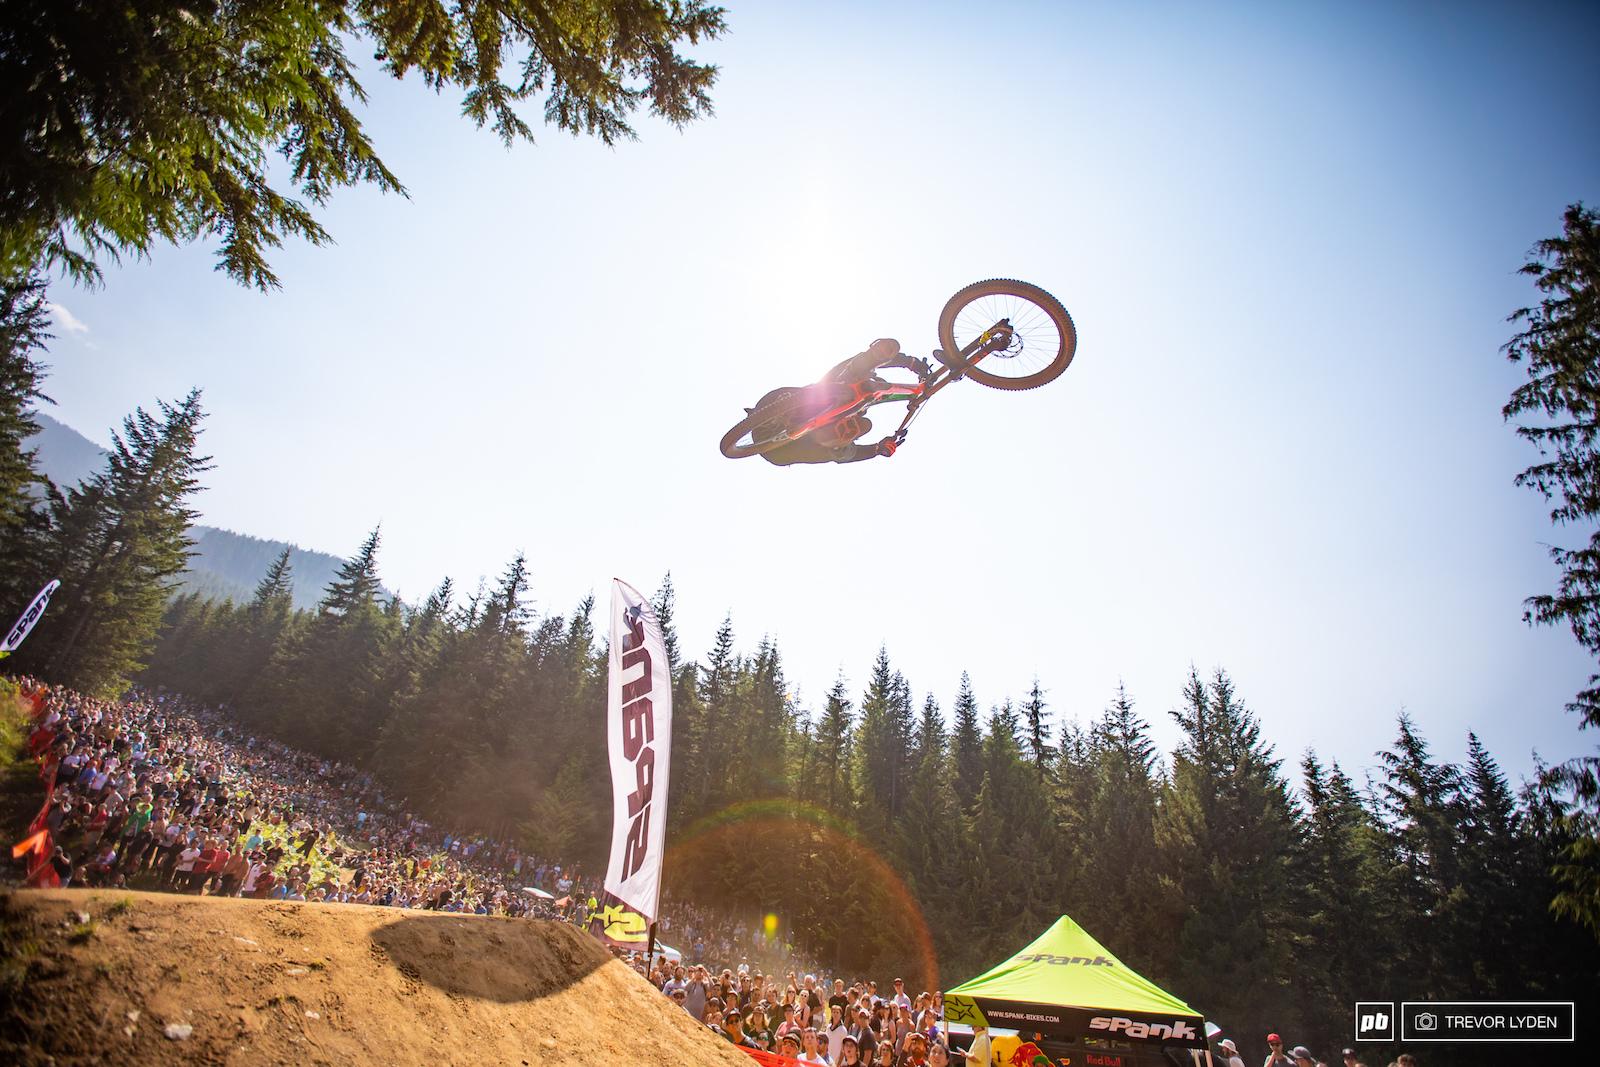 Jumper extrodinaire and YouTube sensation Fabio Wibmer put down some lofty whips